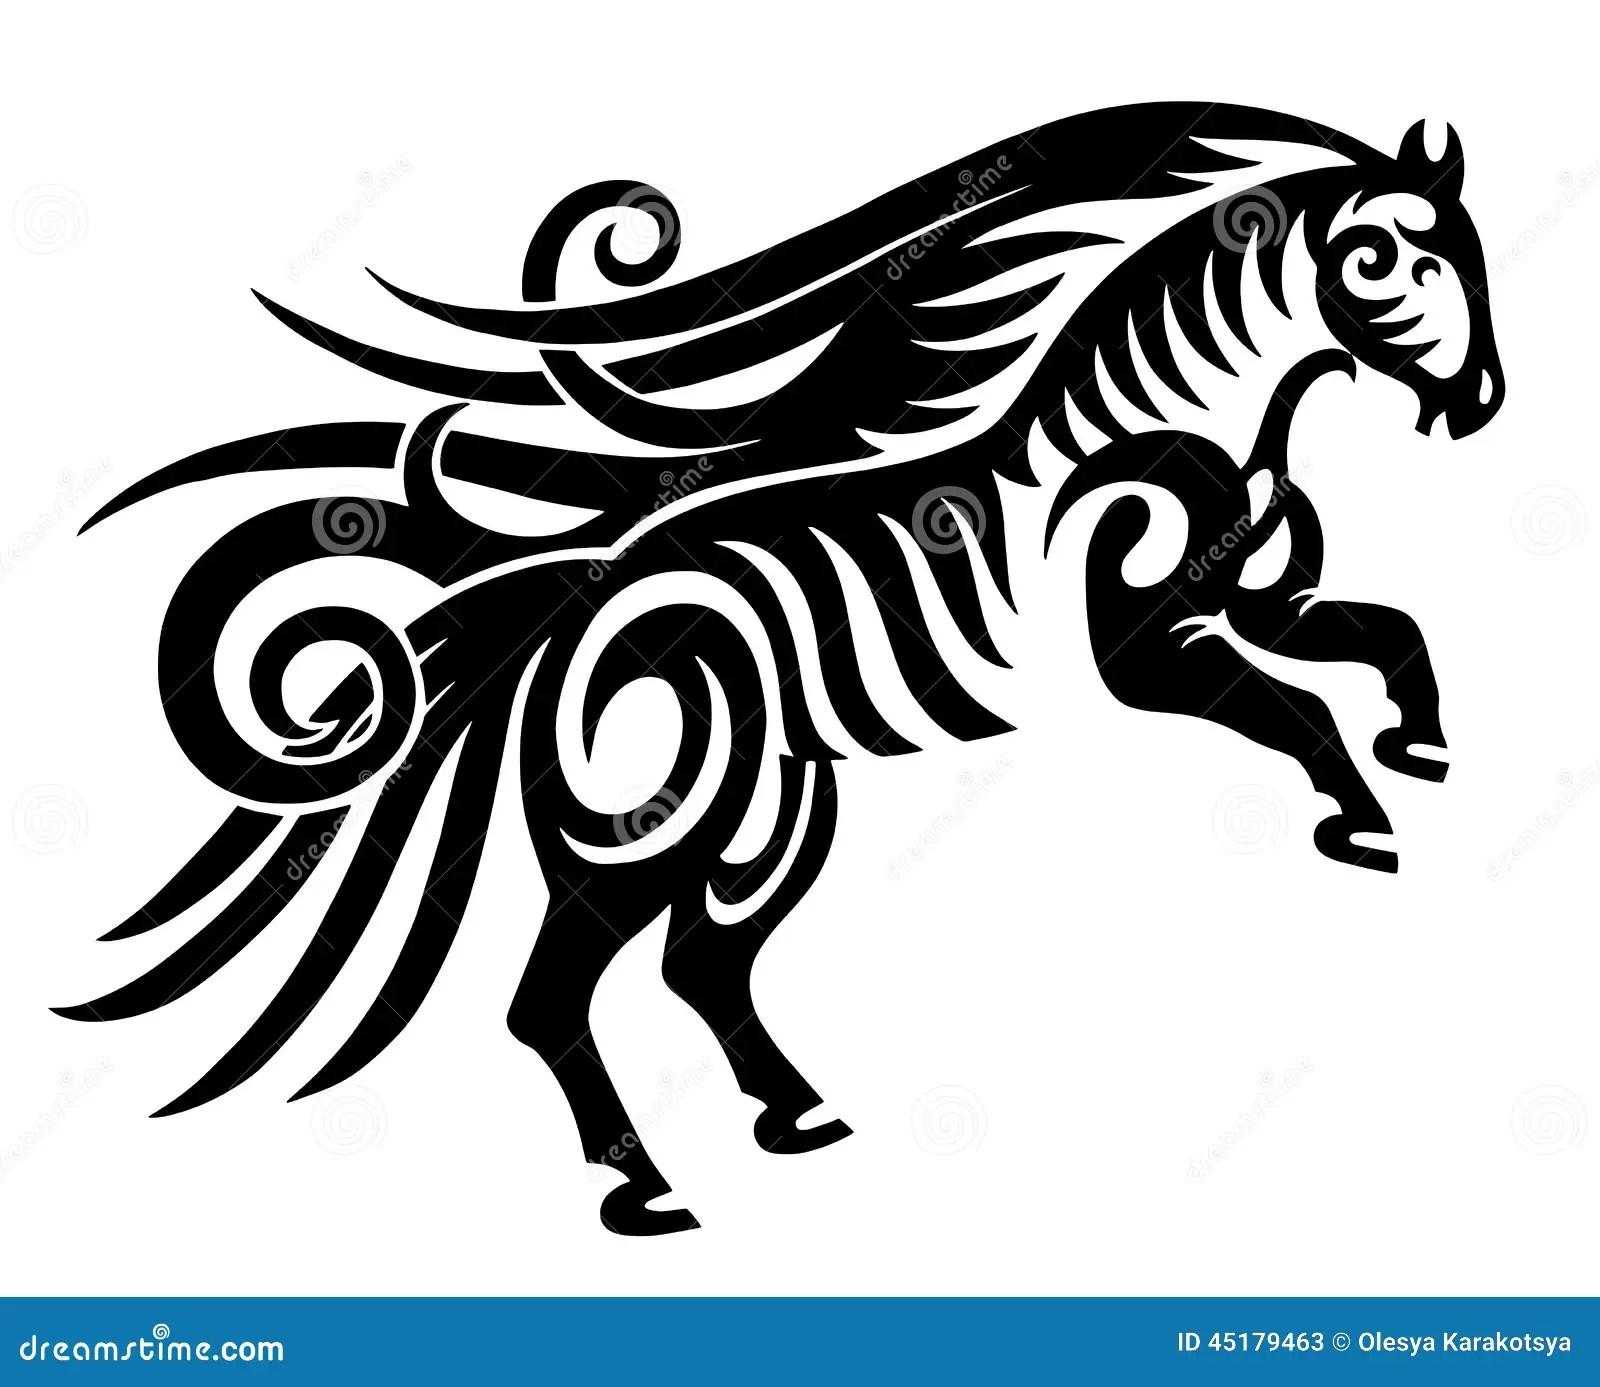 Digital Drawing Of Black Tribal Horse Silhouette Stock